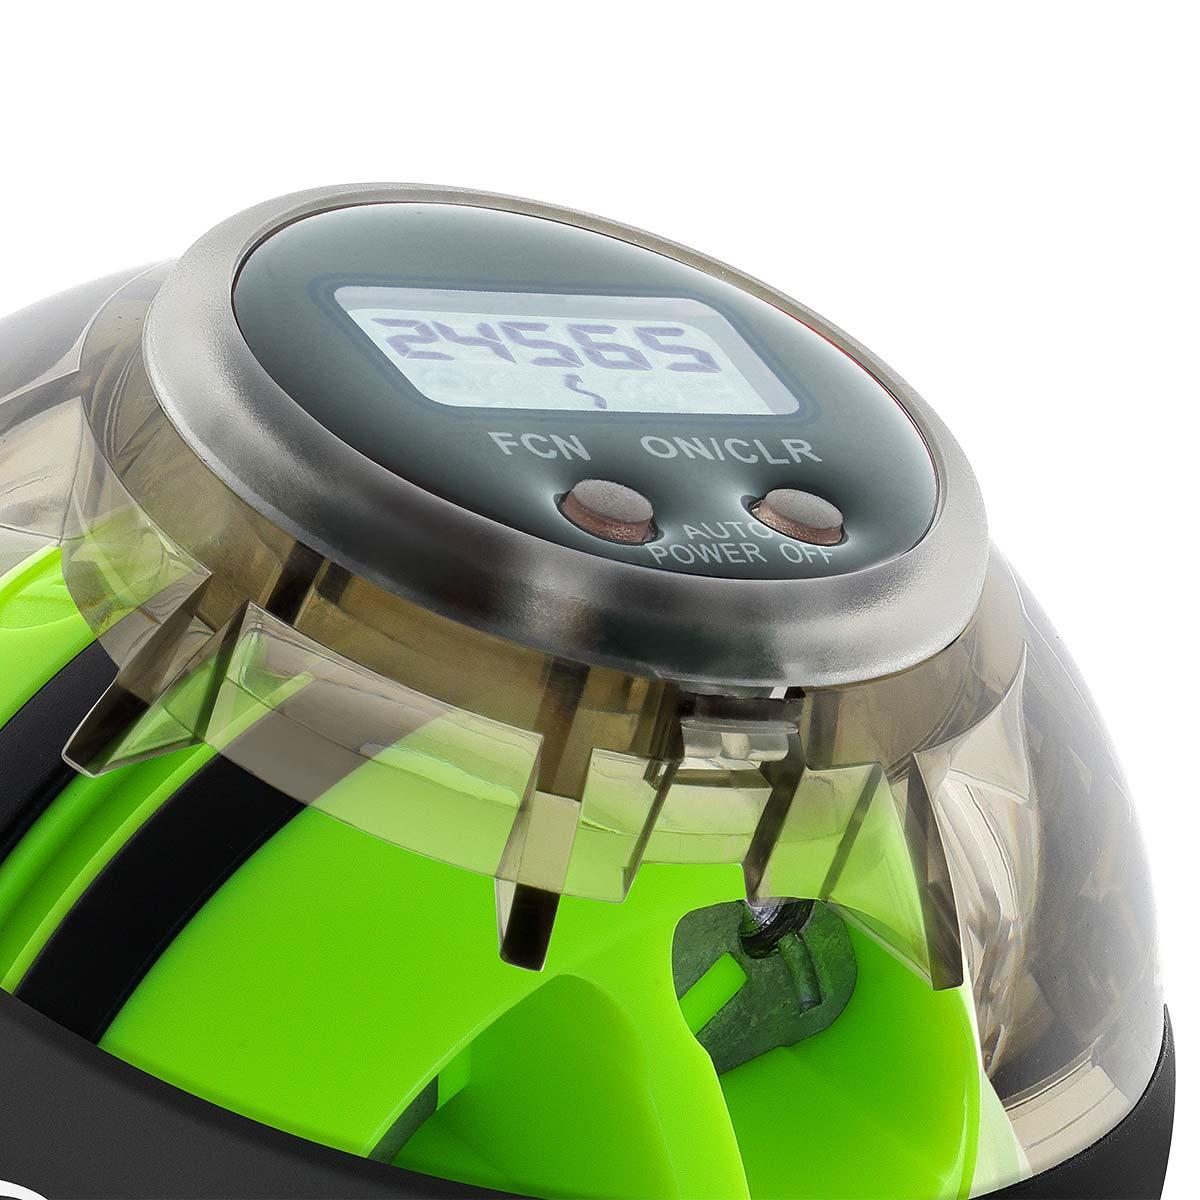 original-powerball-autostart-max-detail